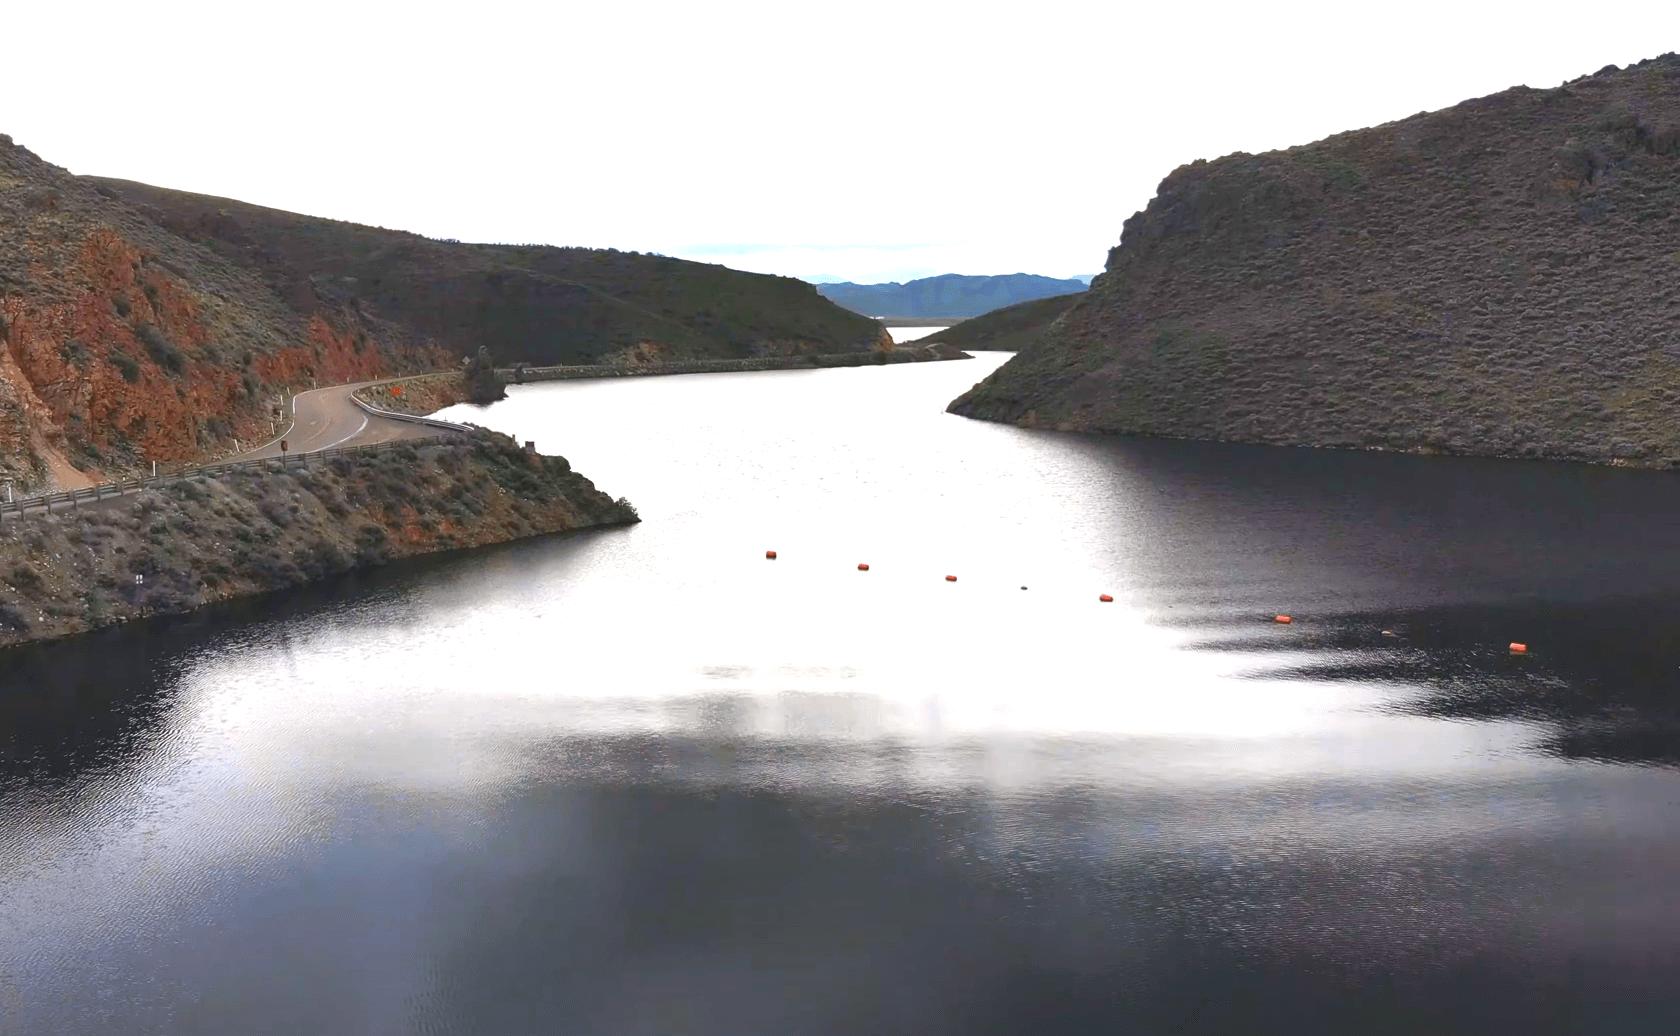 Wild-Horse-Reservoir-Lake-Fishing-Guide-04